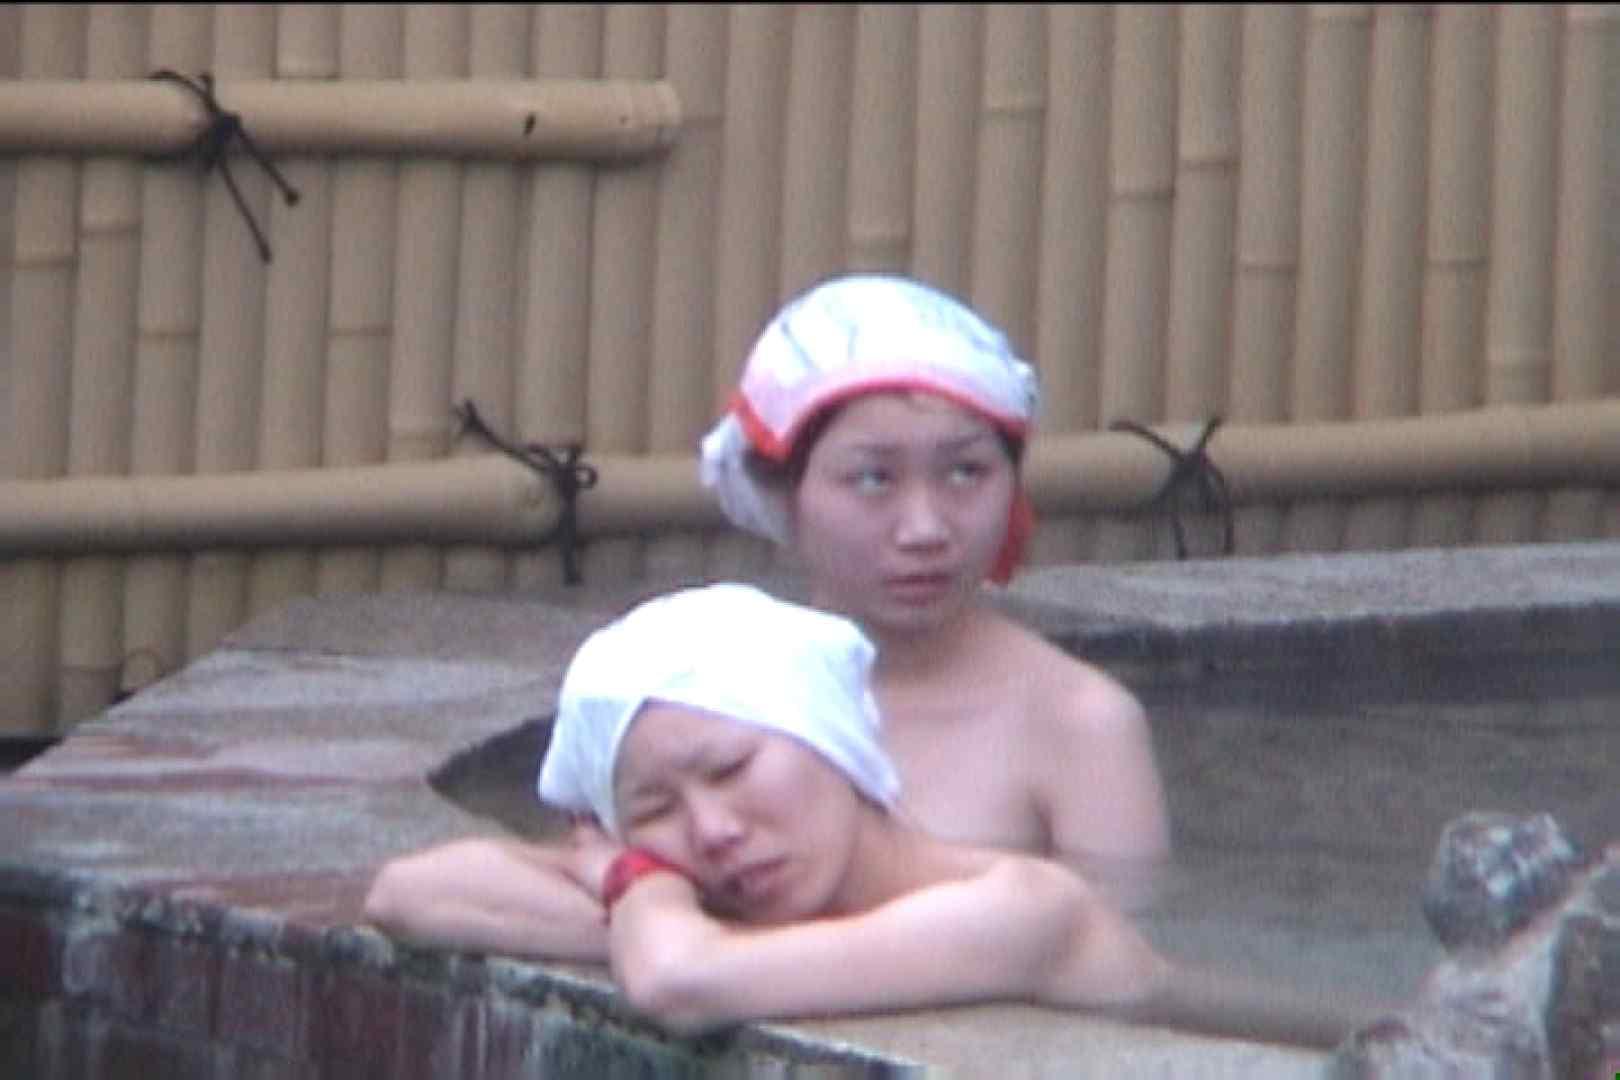 Aquaな露天風呂Vol.91【VIP限定】 盗撮シリーズ | 露天風呂編  99PIX 23